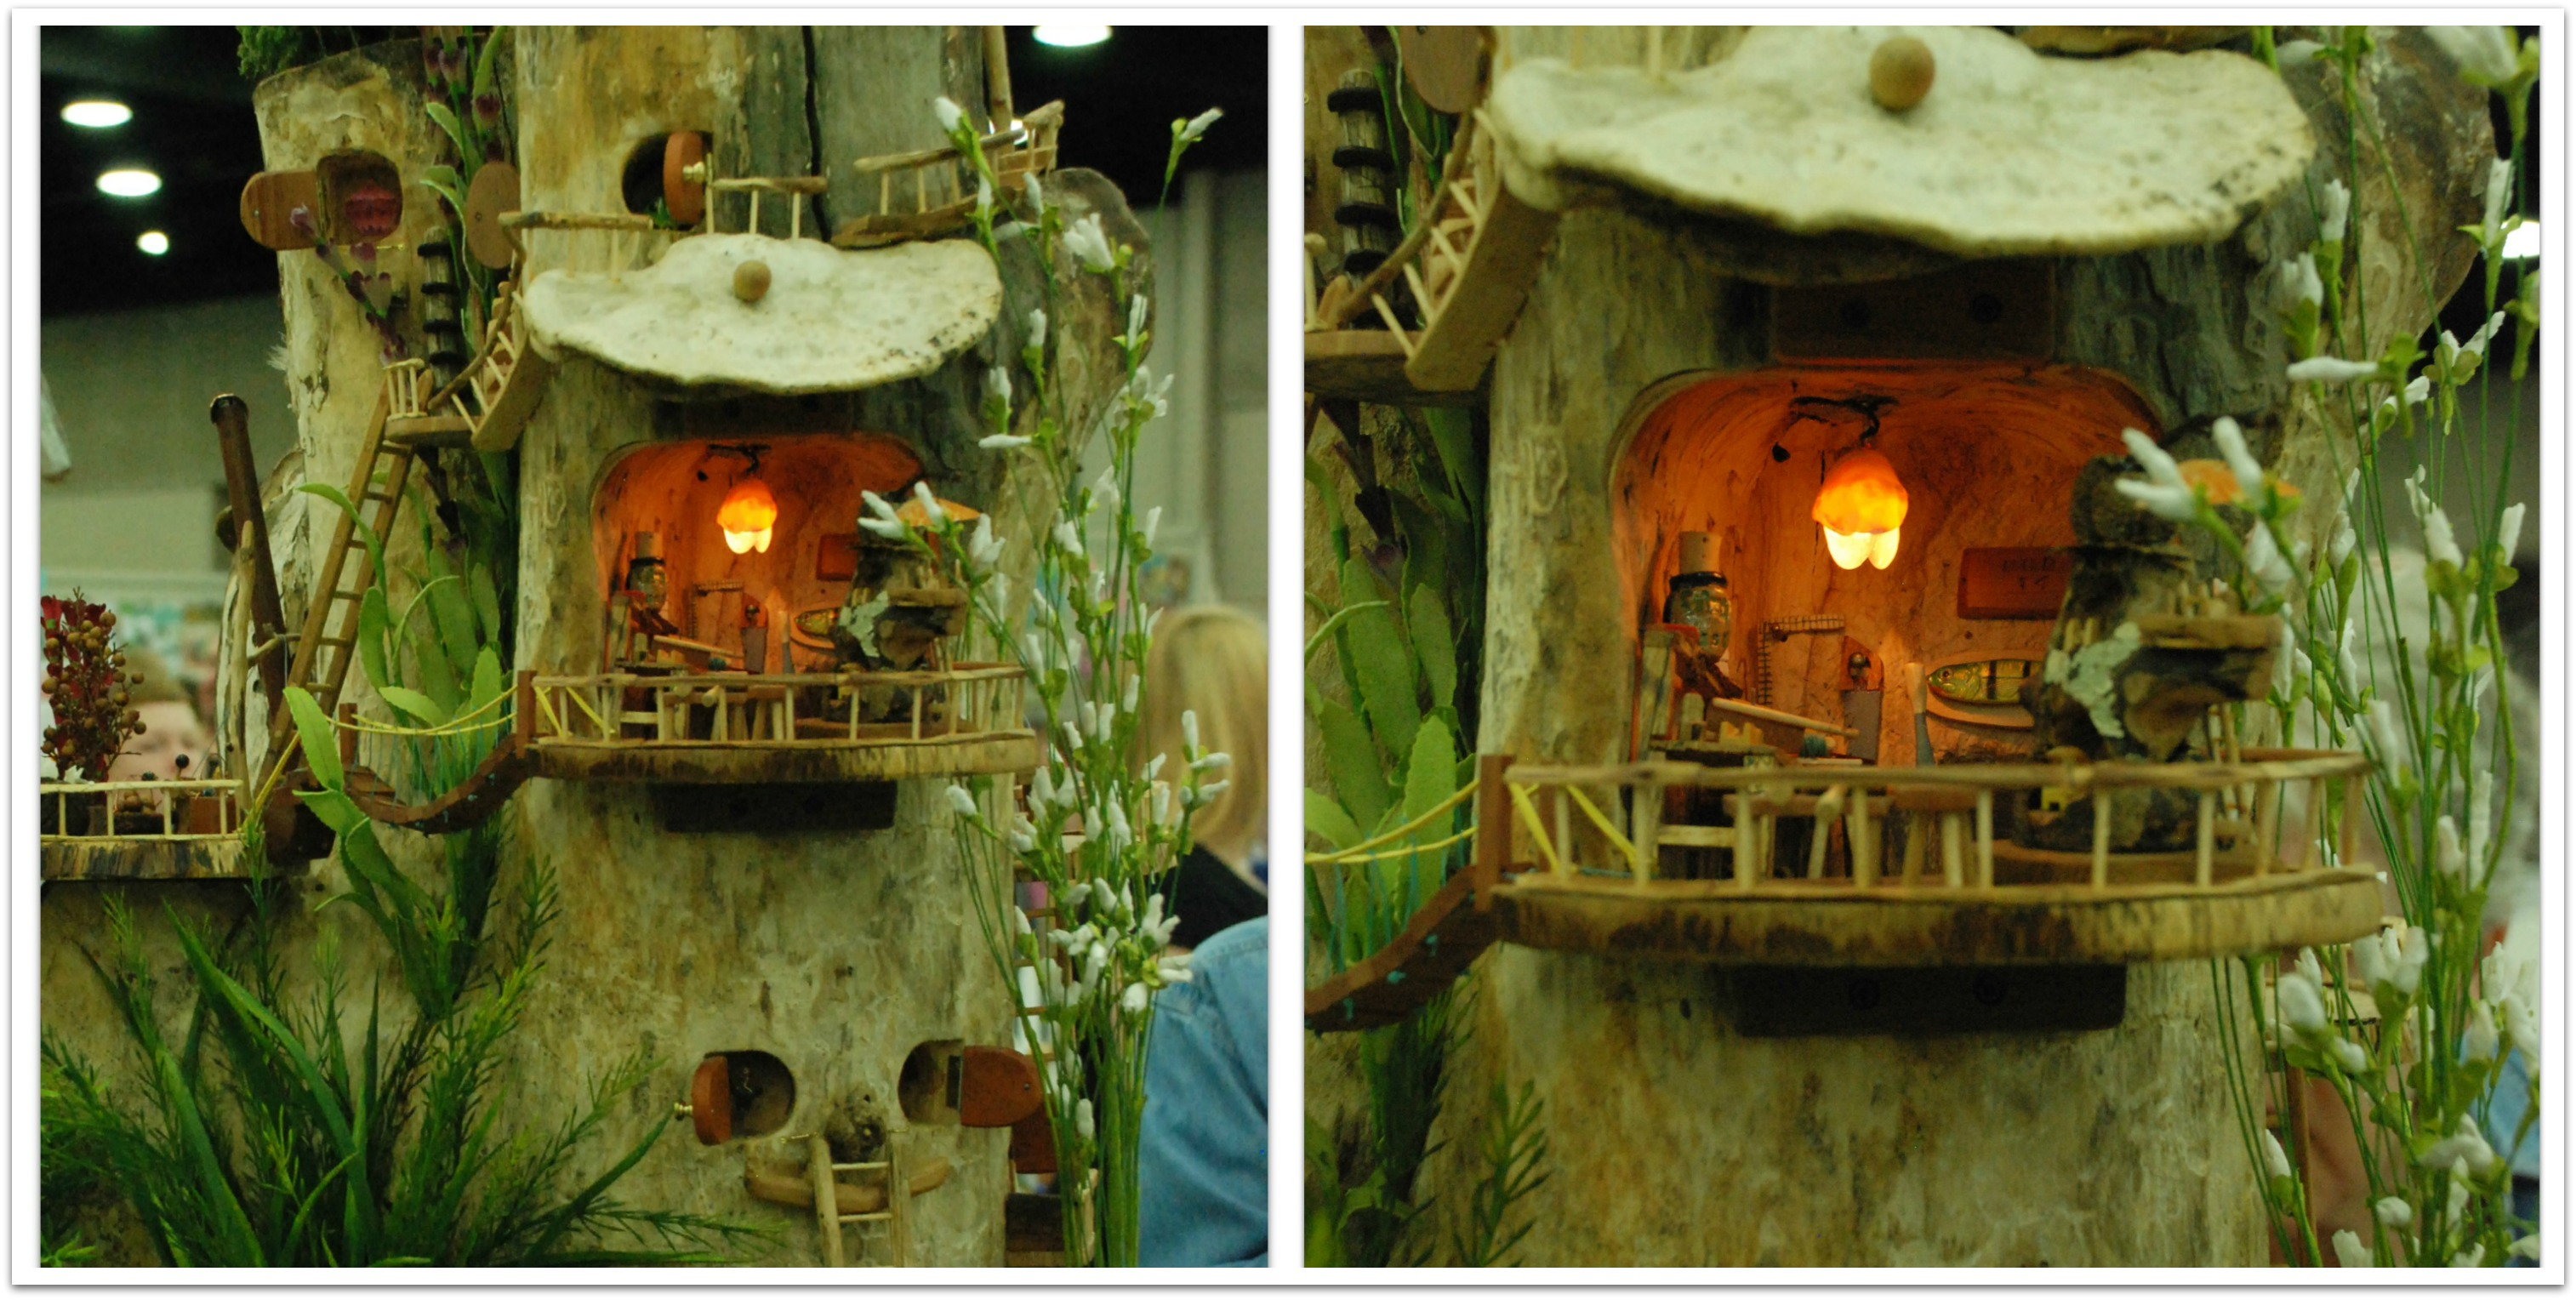 Tree stump fairy house - Tree Stump Fairy House 42